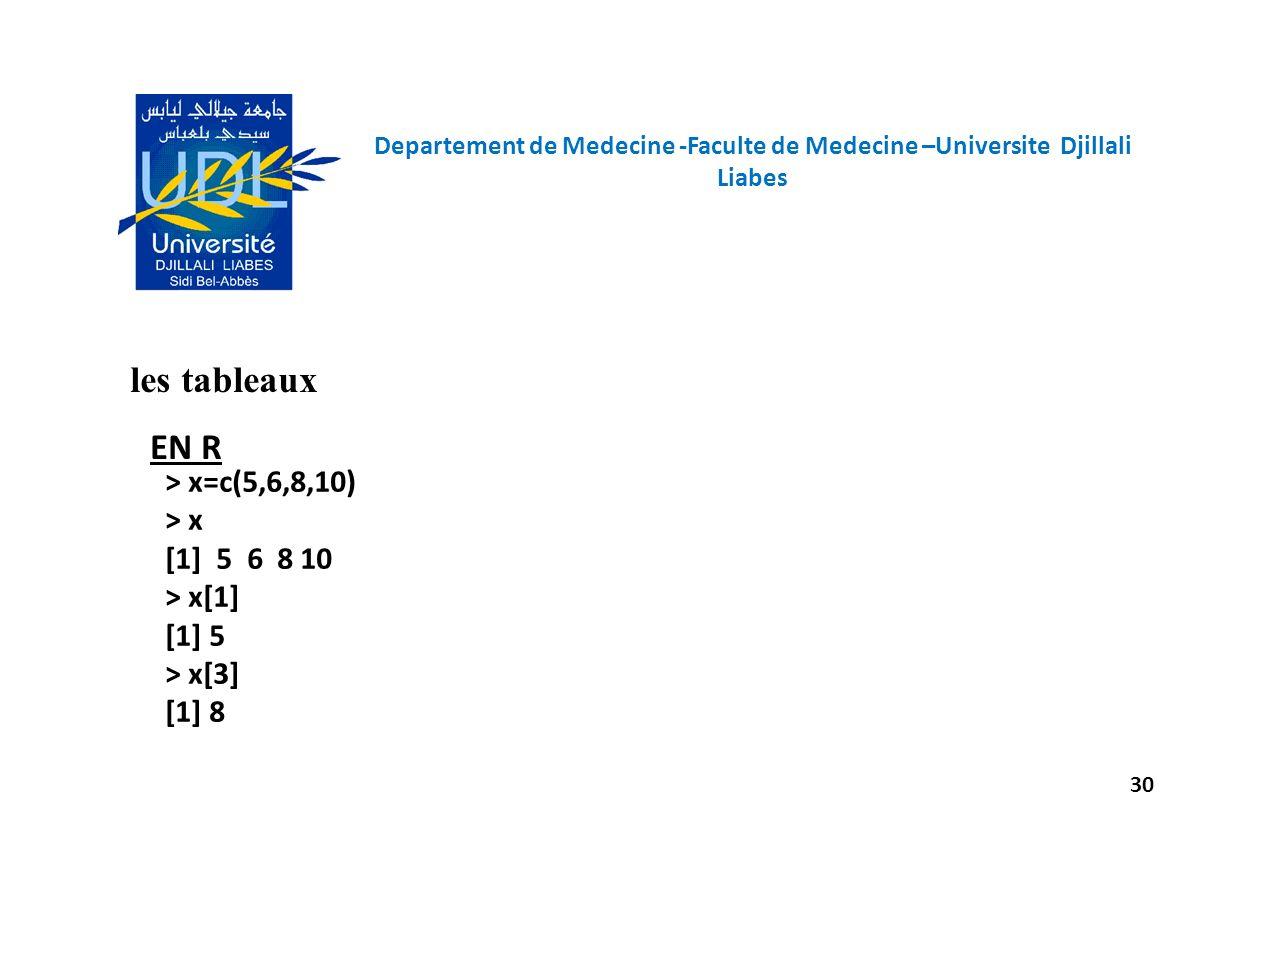 Departement de Medecine -Faculte de Medecine –Universite Djillali Liabes 30 EN R > x=c(5,6,8,10) > x [1] 5 6 8 10 > x[1] [1] 5 > x[3] [1] 8 les tablea